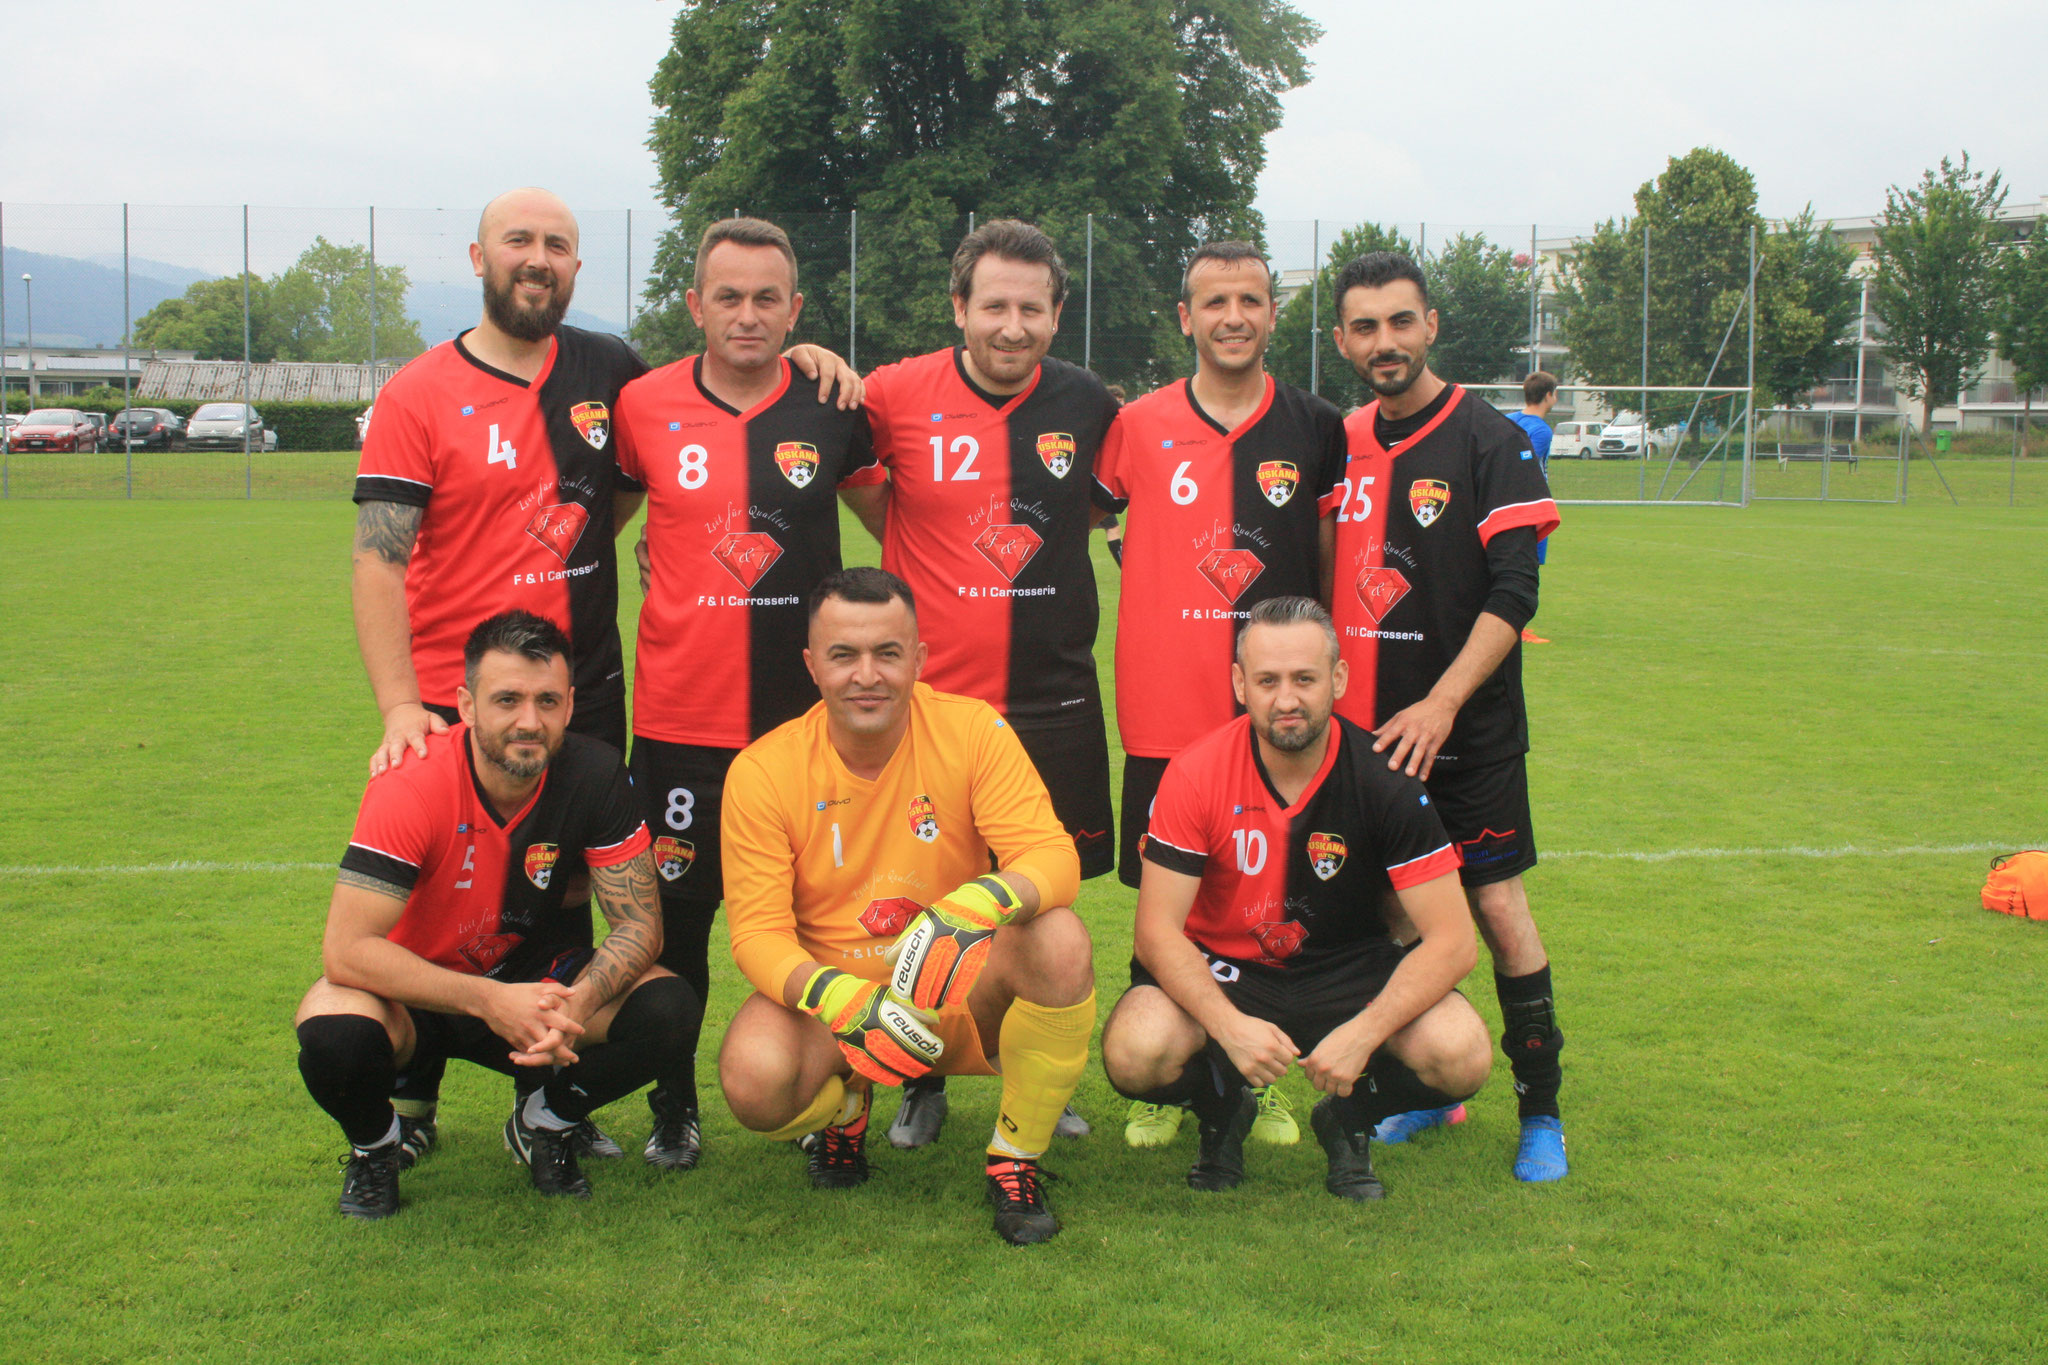 FC Uskana Olten